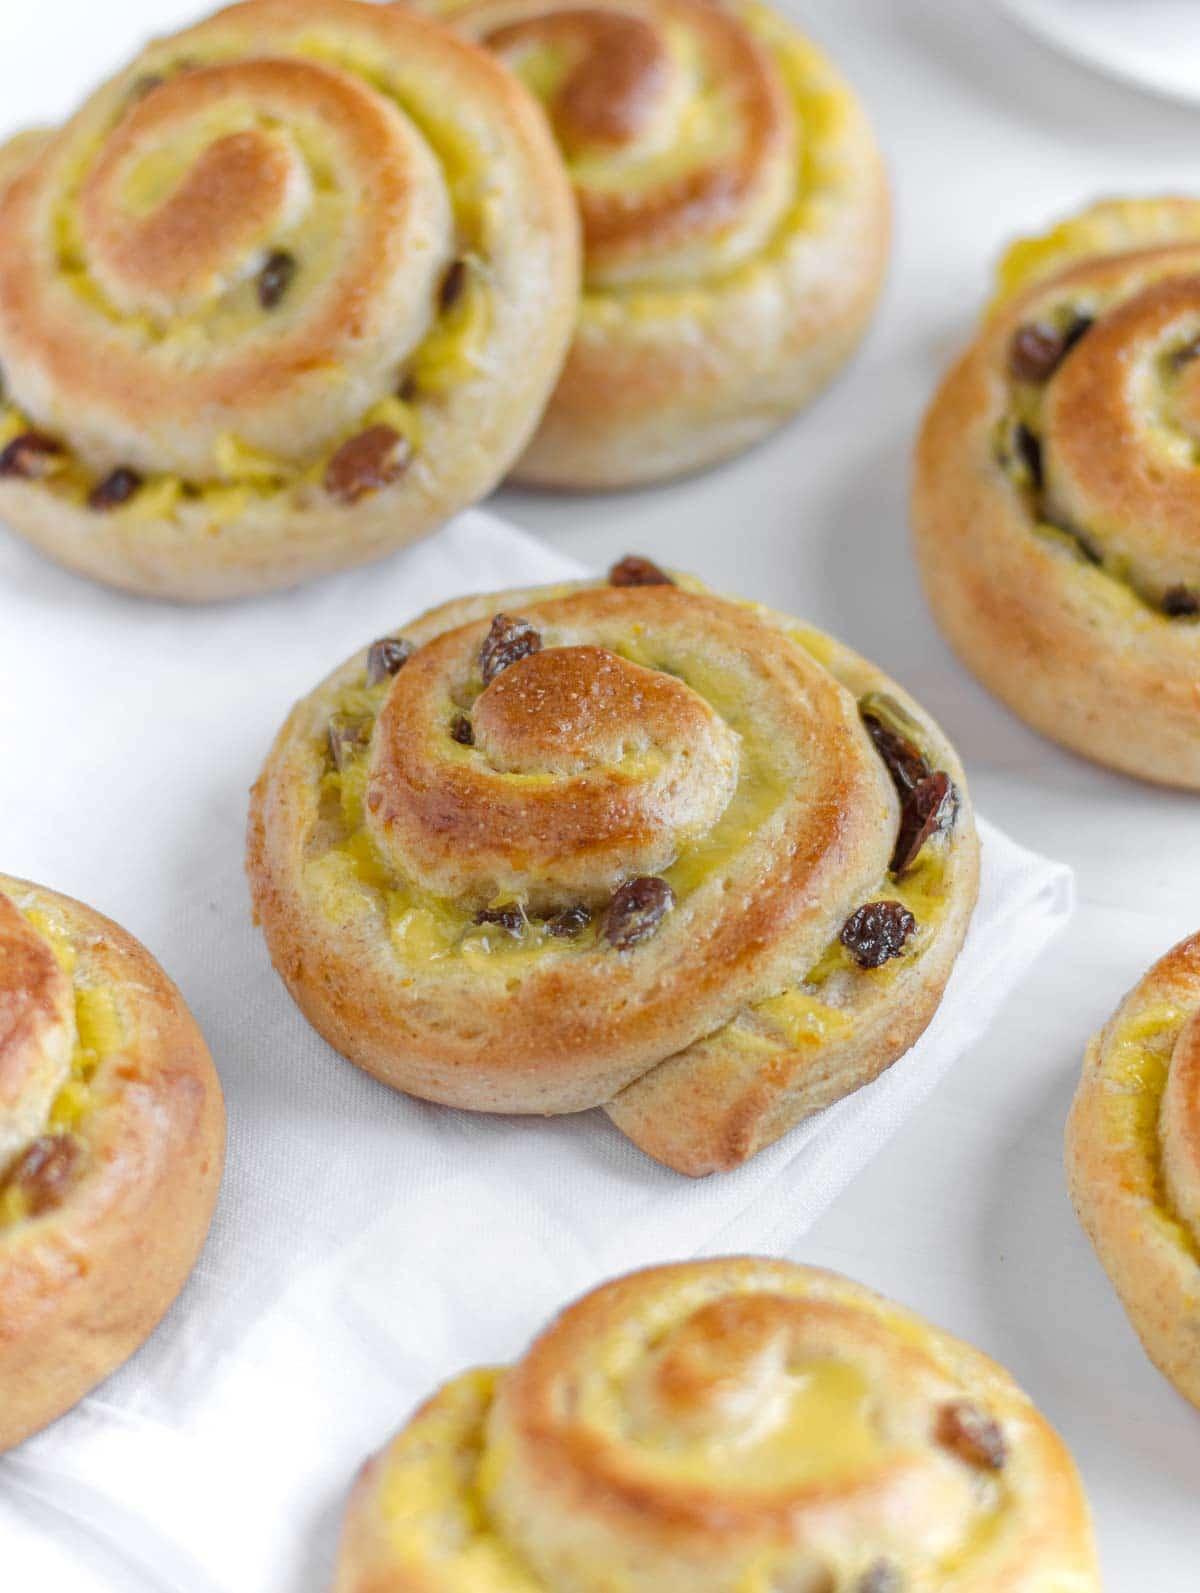 vegan brioche roll with custard